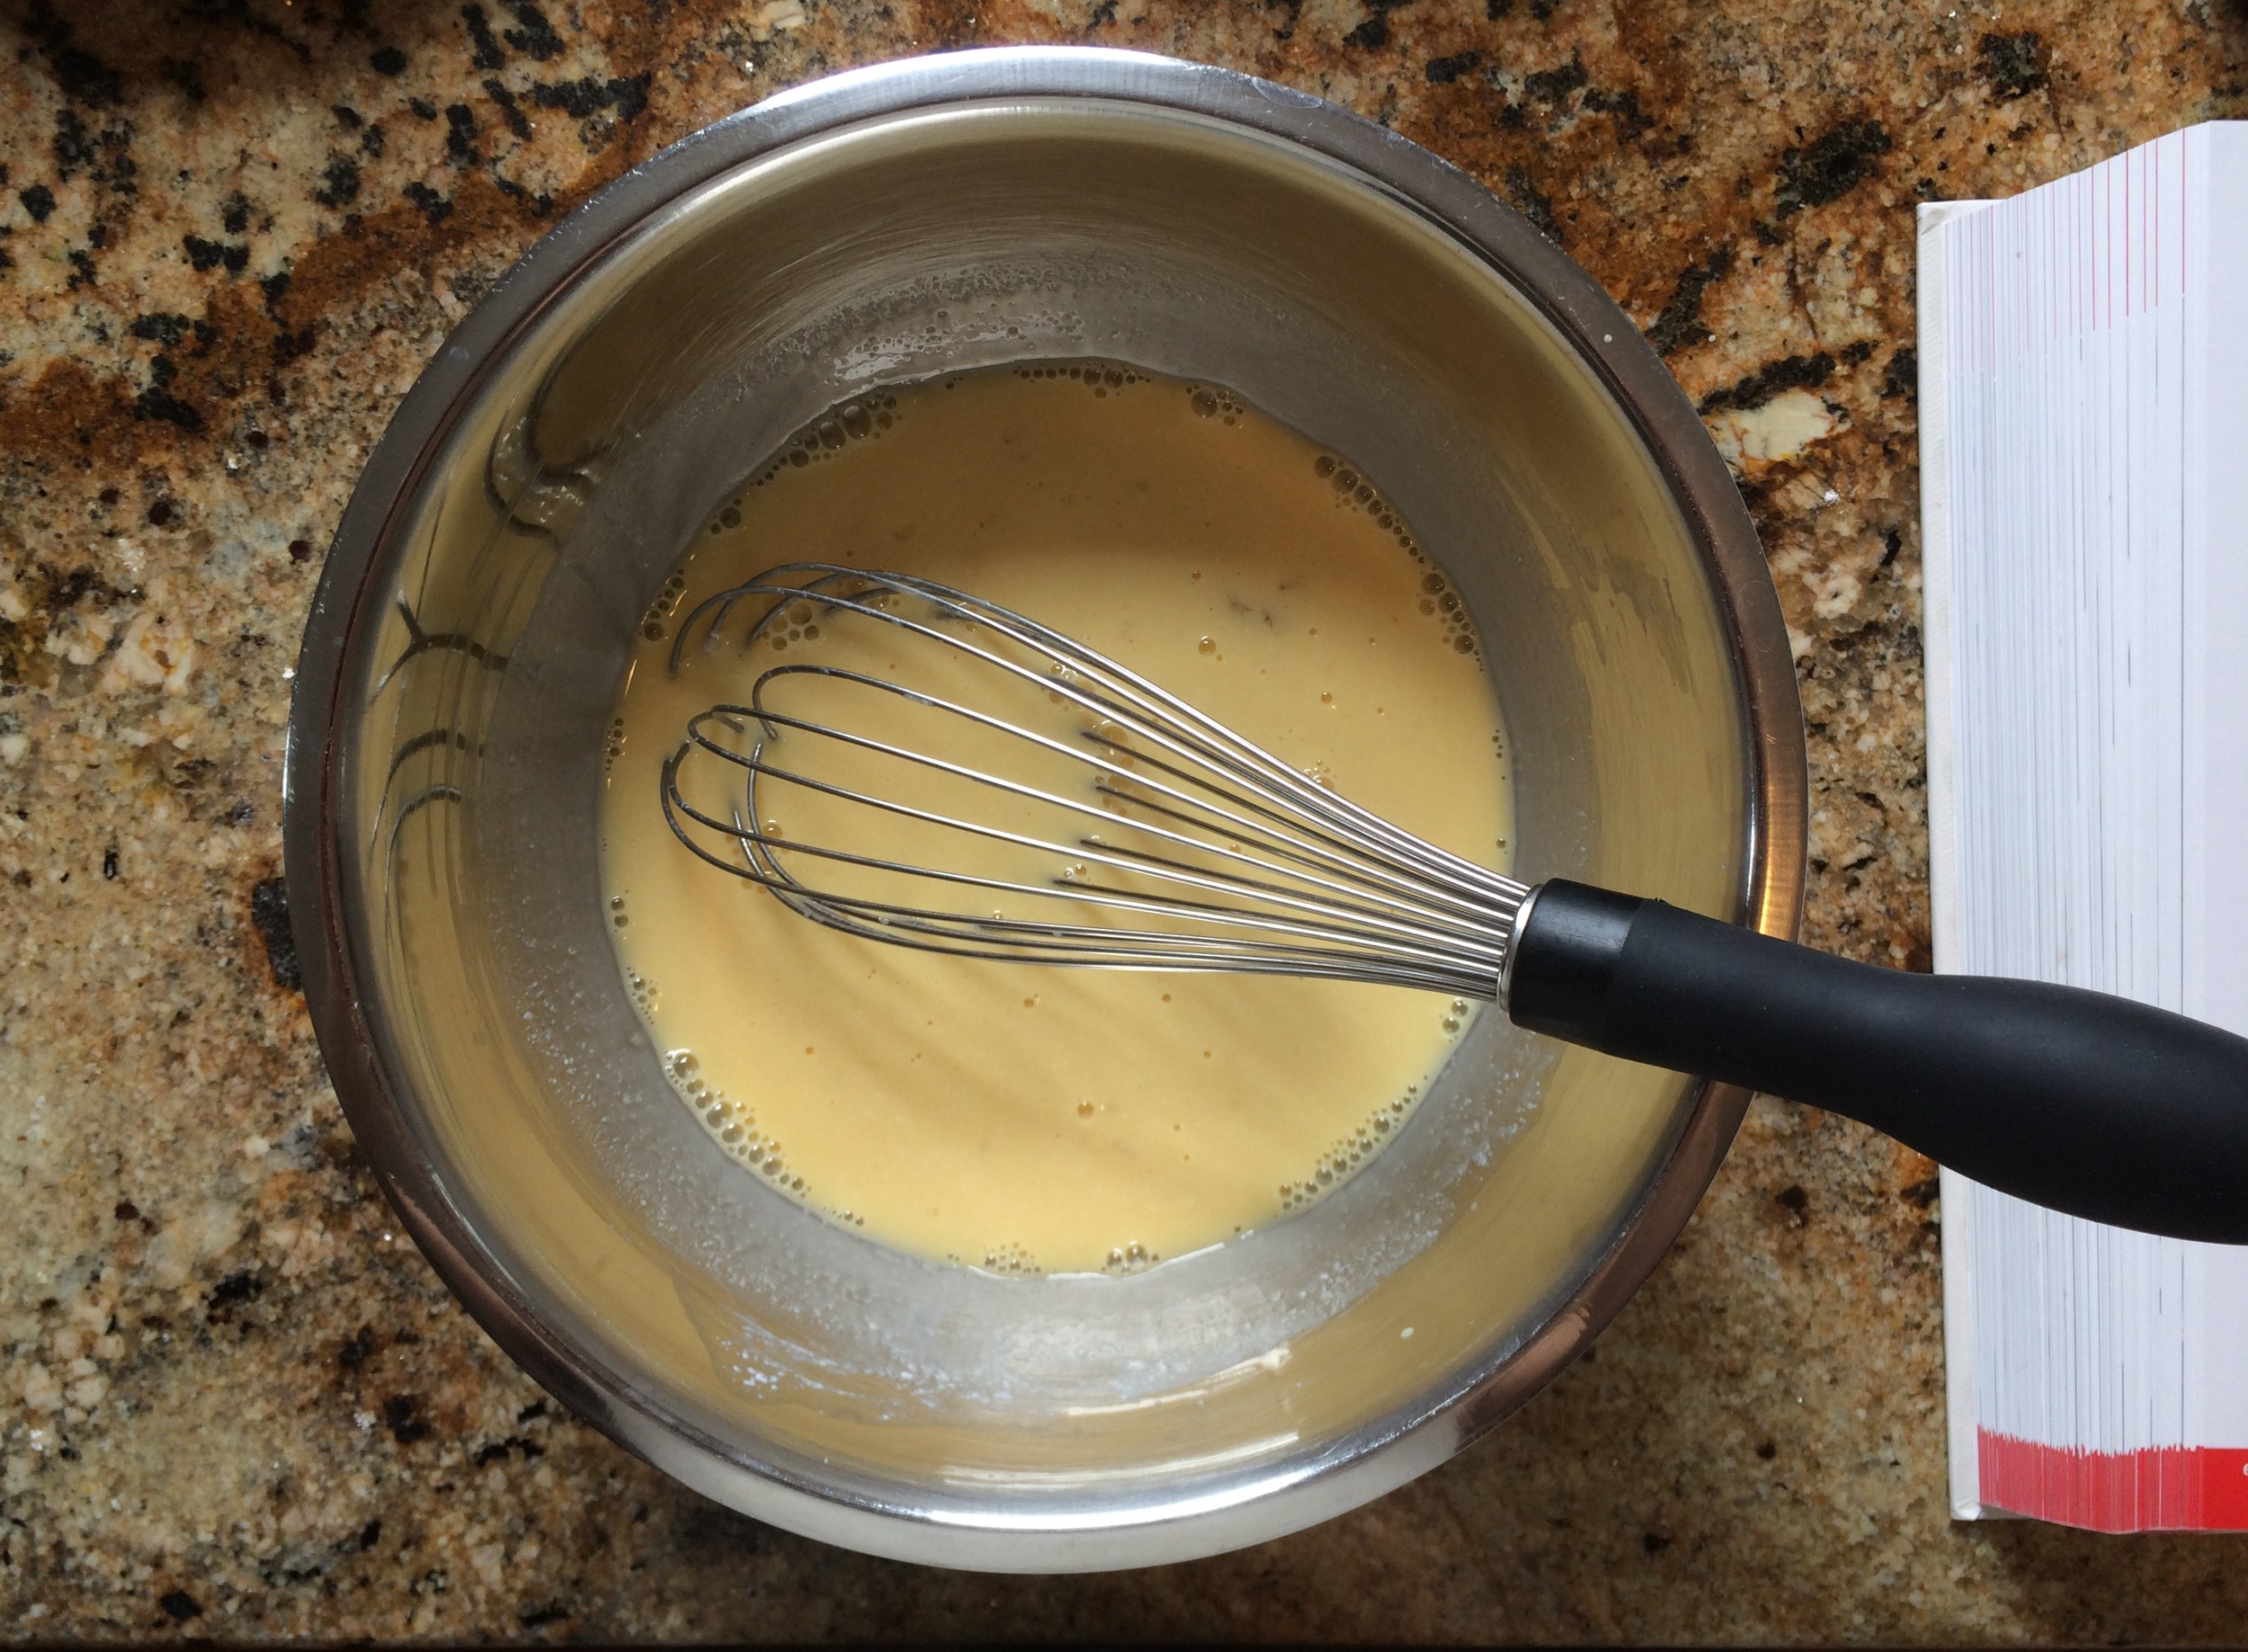 Buttermilk mixture